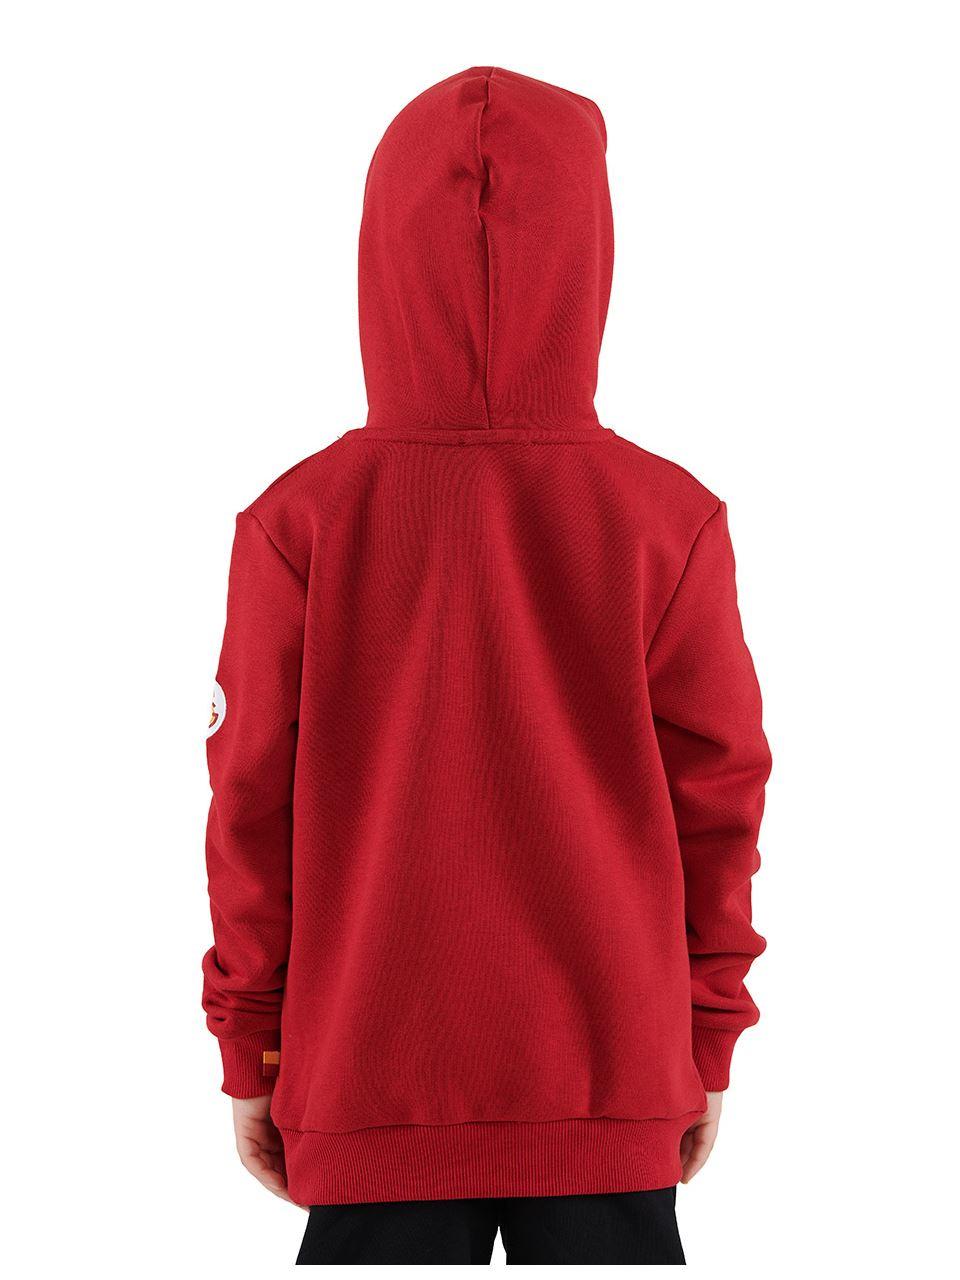 C95061 Sweatshirt